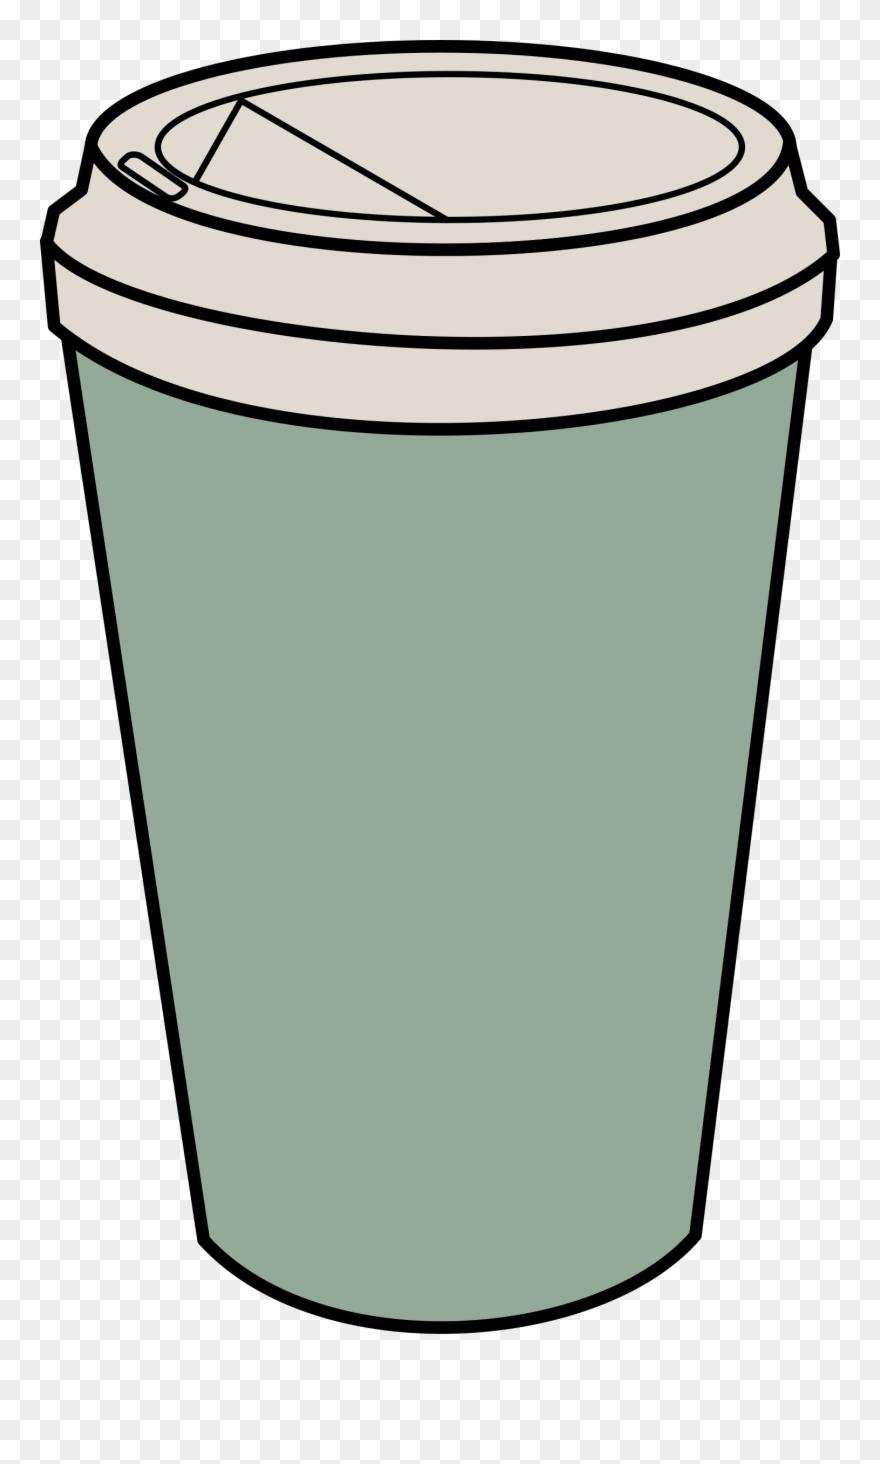 Clipart Cup Tumbler.